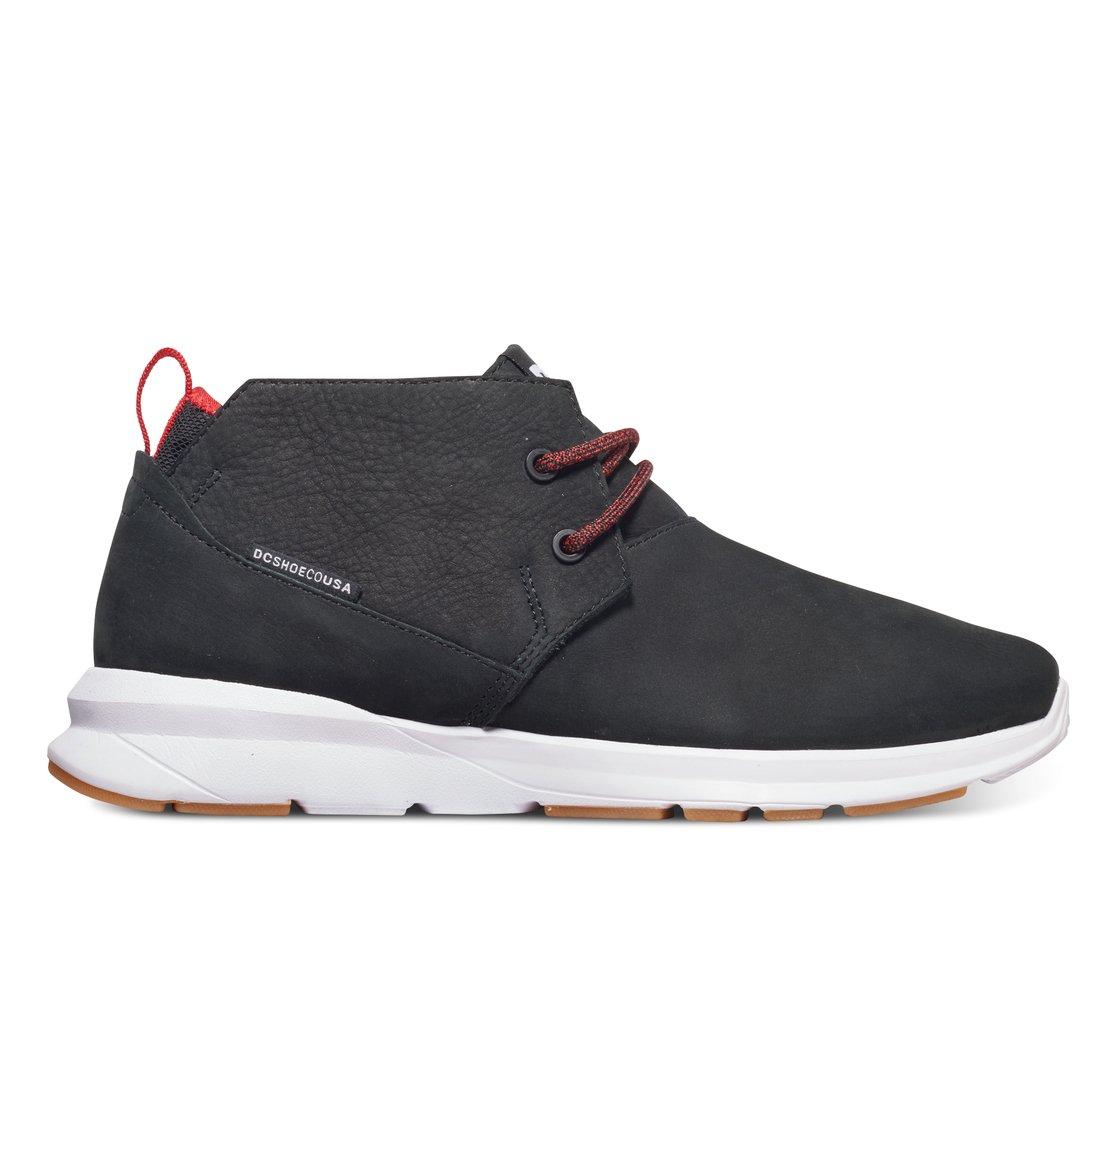 Dc Zapato Hombres Le Shoes Adys100367 Ashlar Media Bota P68w7Cq